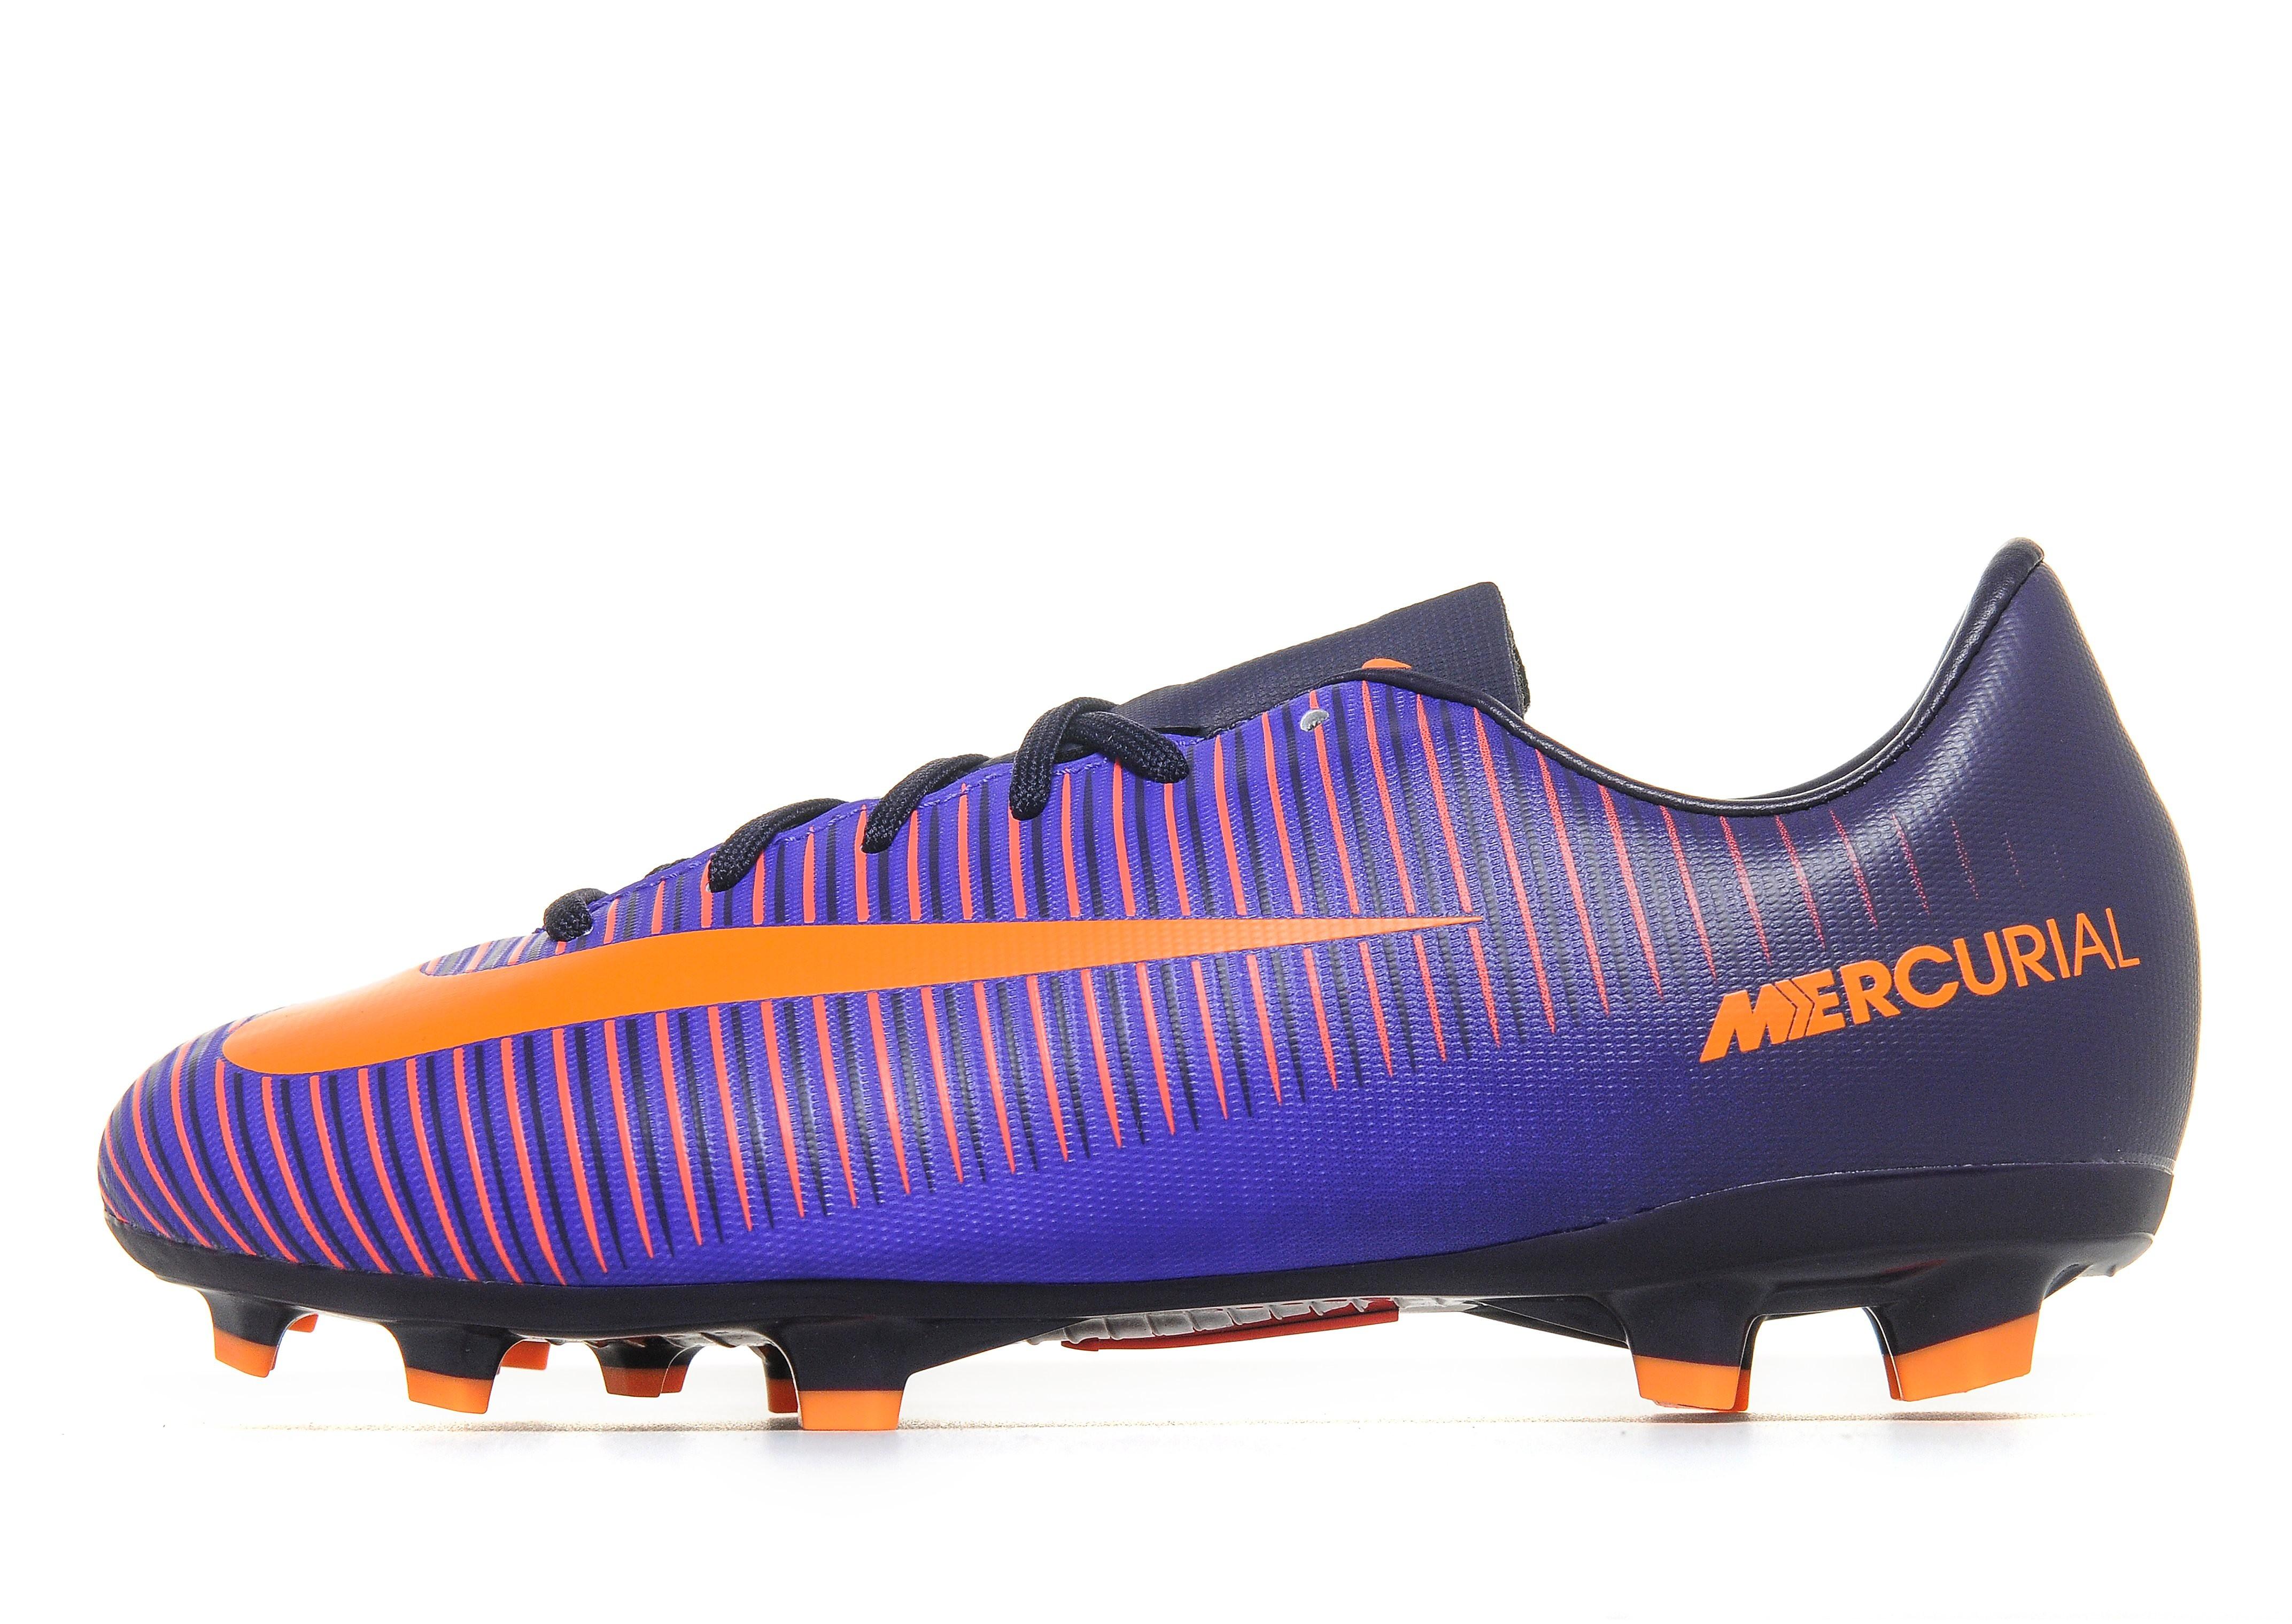 Nike Floodlight Mercurial Vapor XI FG Children